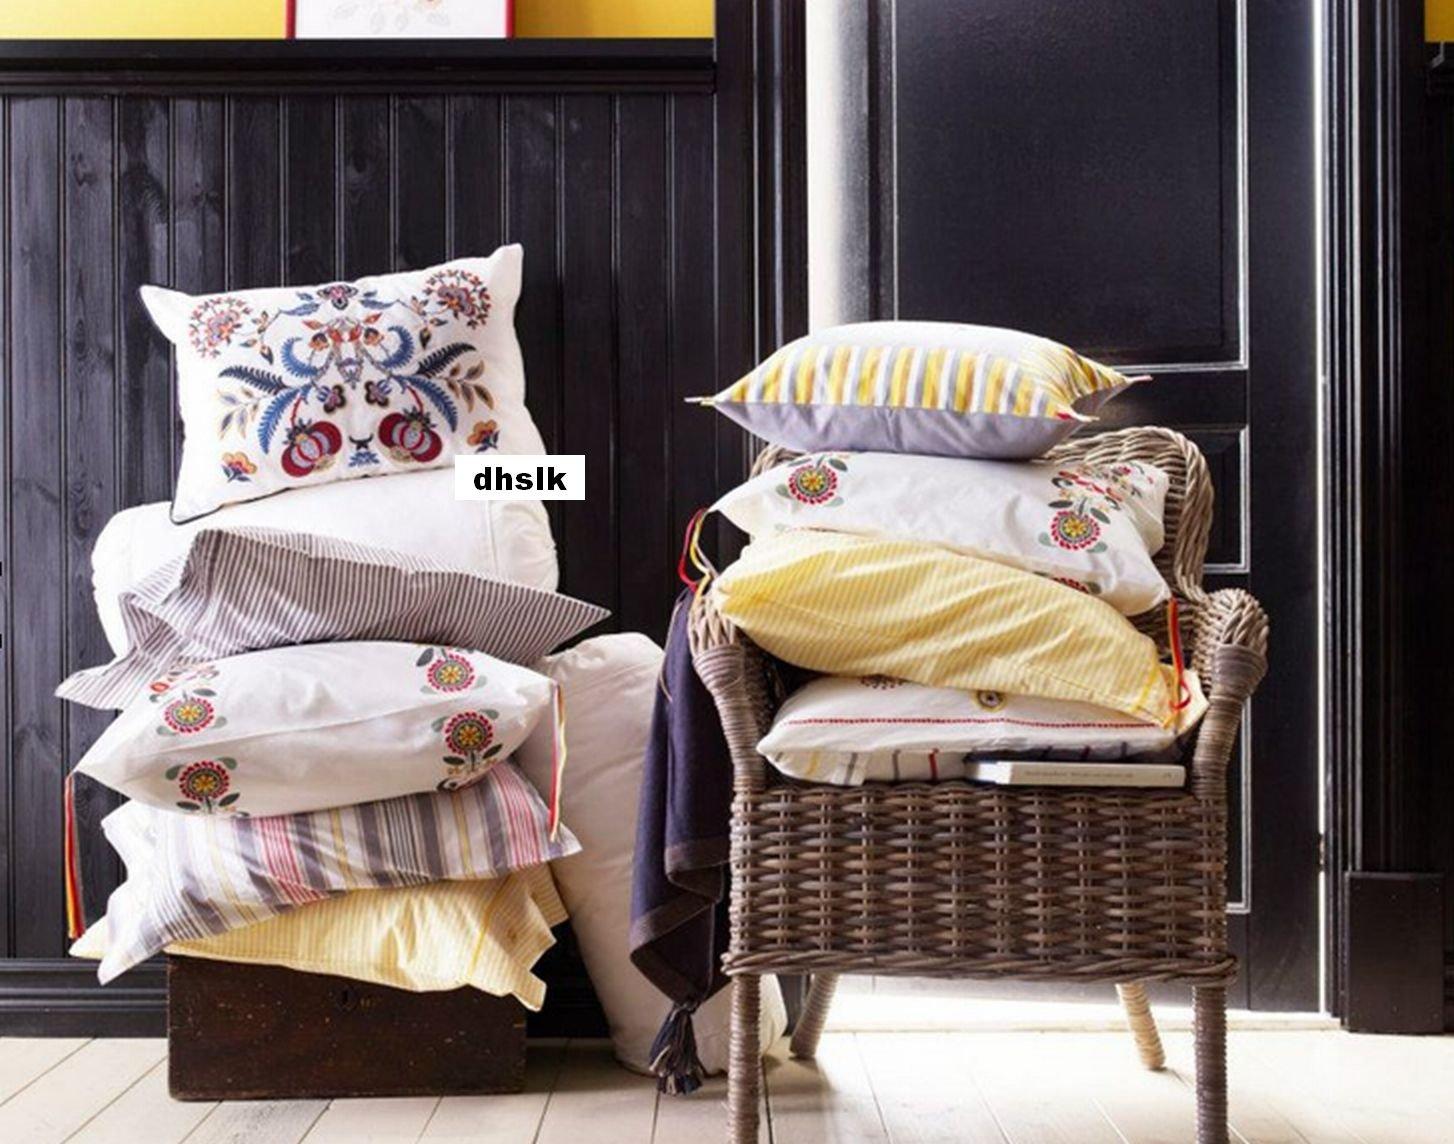 Ikea alvine spetsig embroidered pillow sham cushion cover for Euro shams ikea